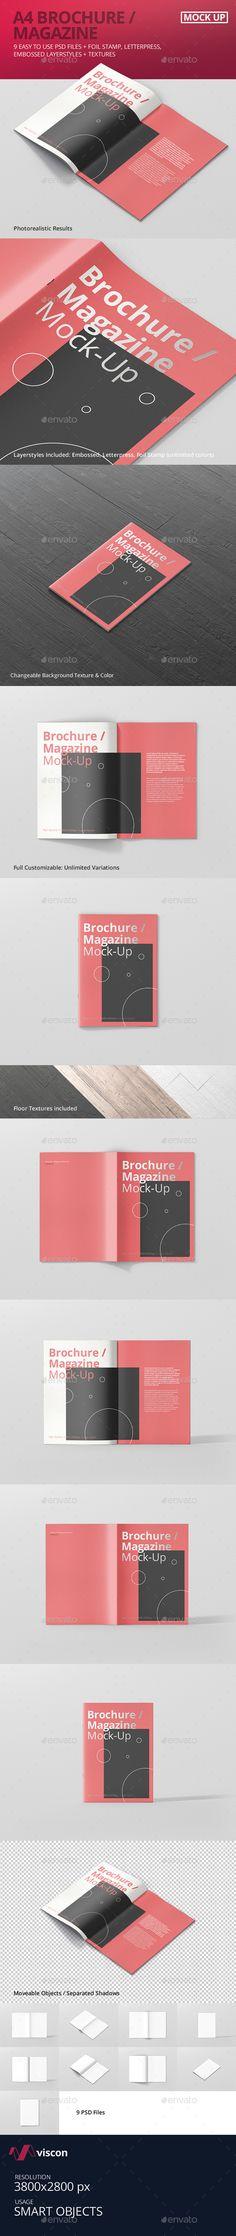 A4 Brochure / Magazine Mock-Up. Download here: http://graphicriver.net/item/a4-brochure-magazine-mockup/16534817?ref=ksioks